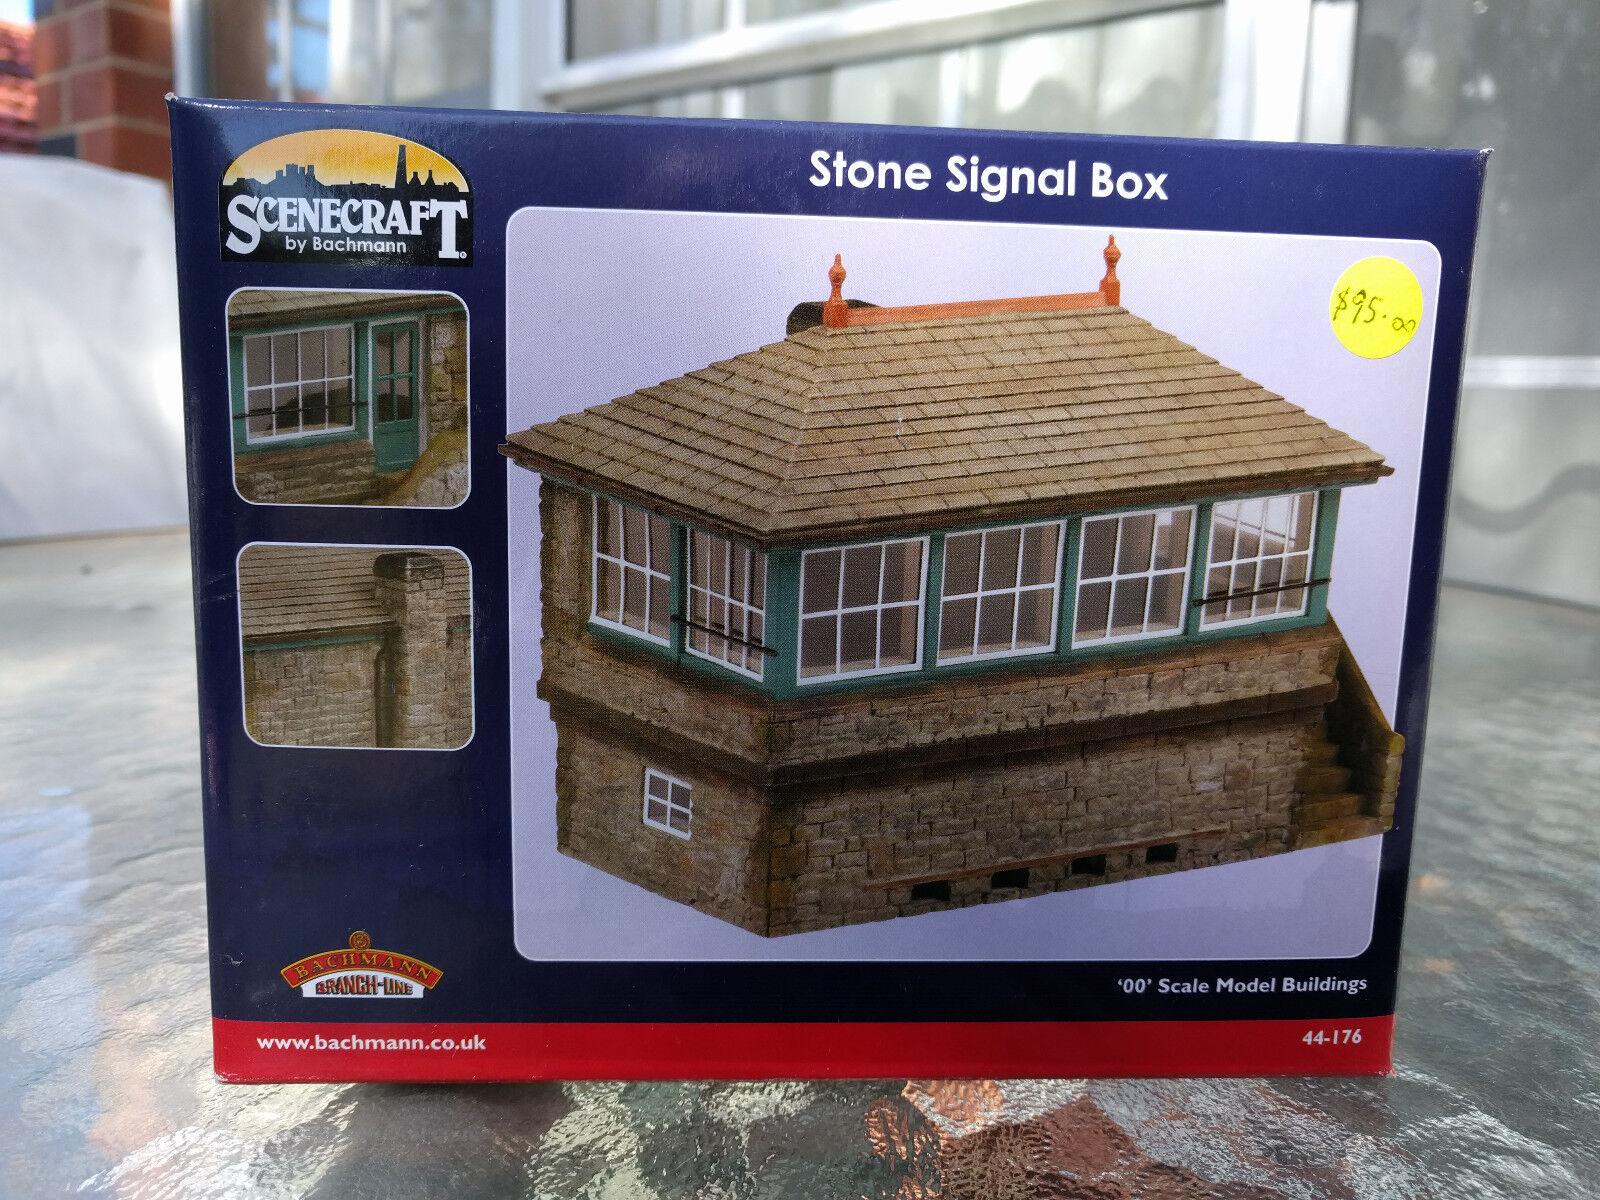 Bachmann Scenecraft Stone Signal Box ref 44-176